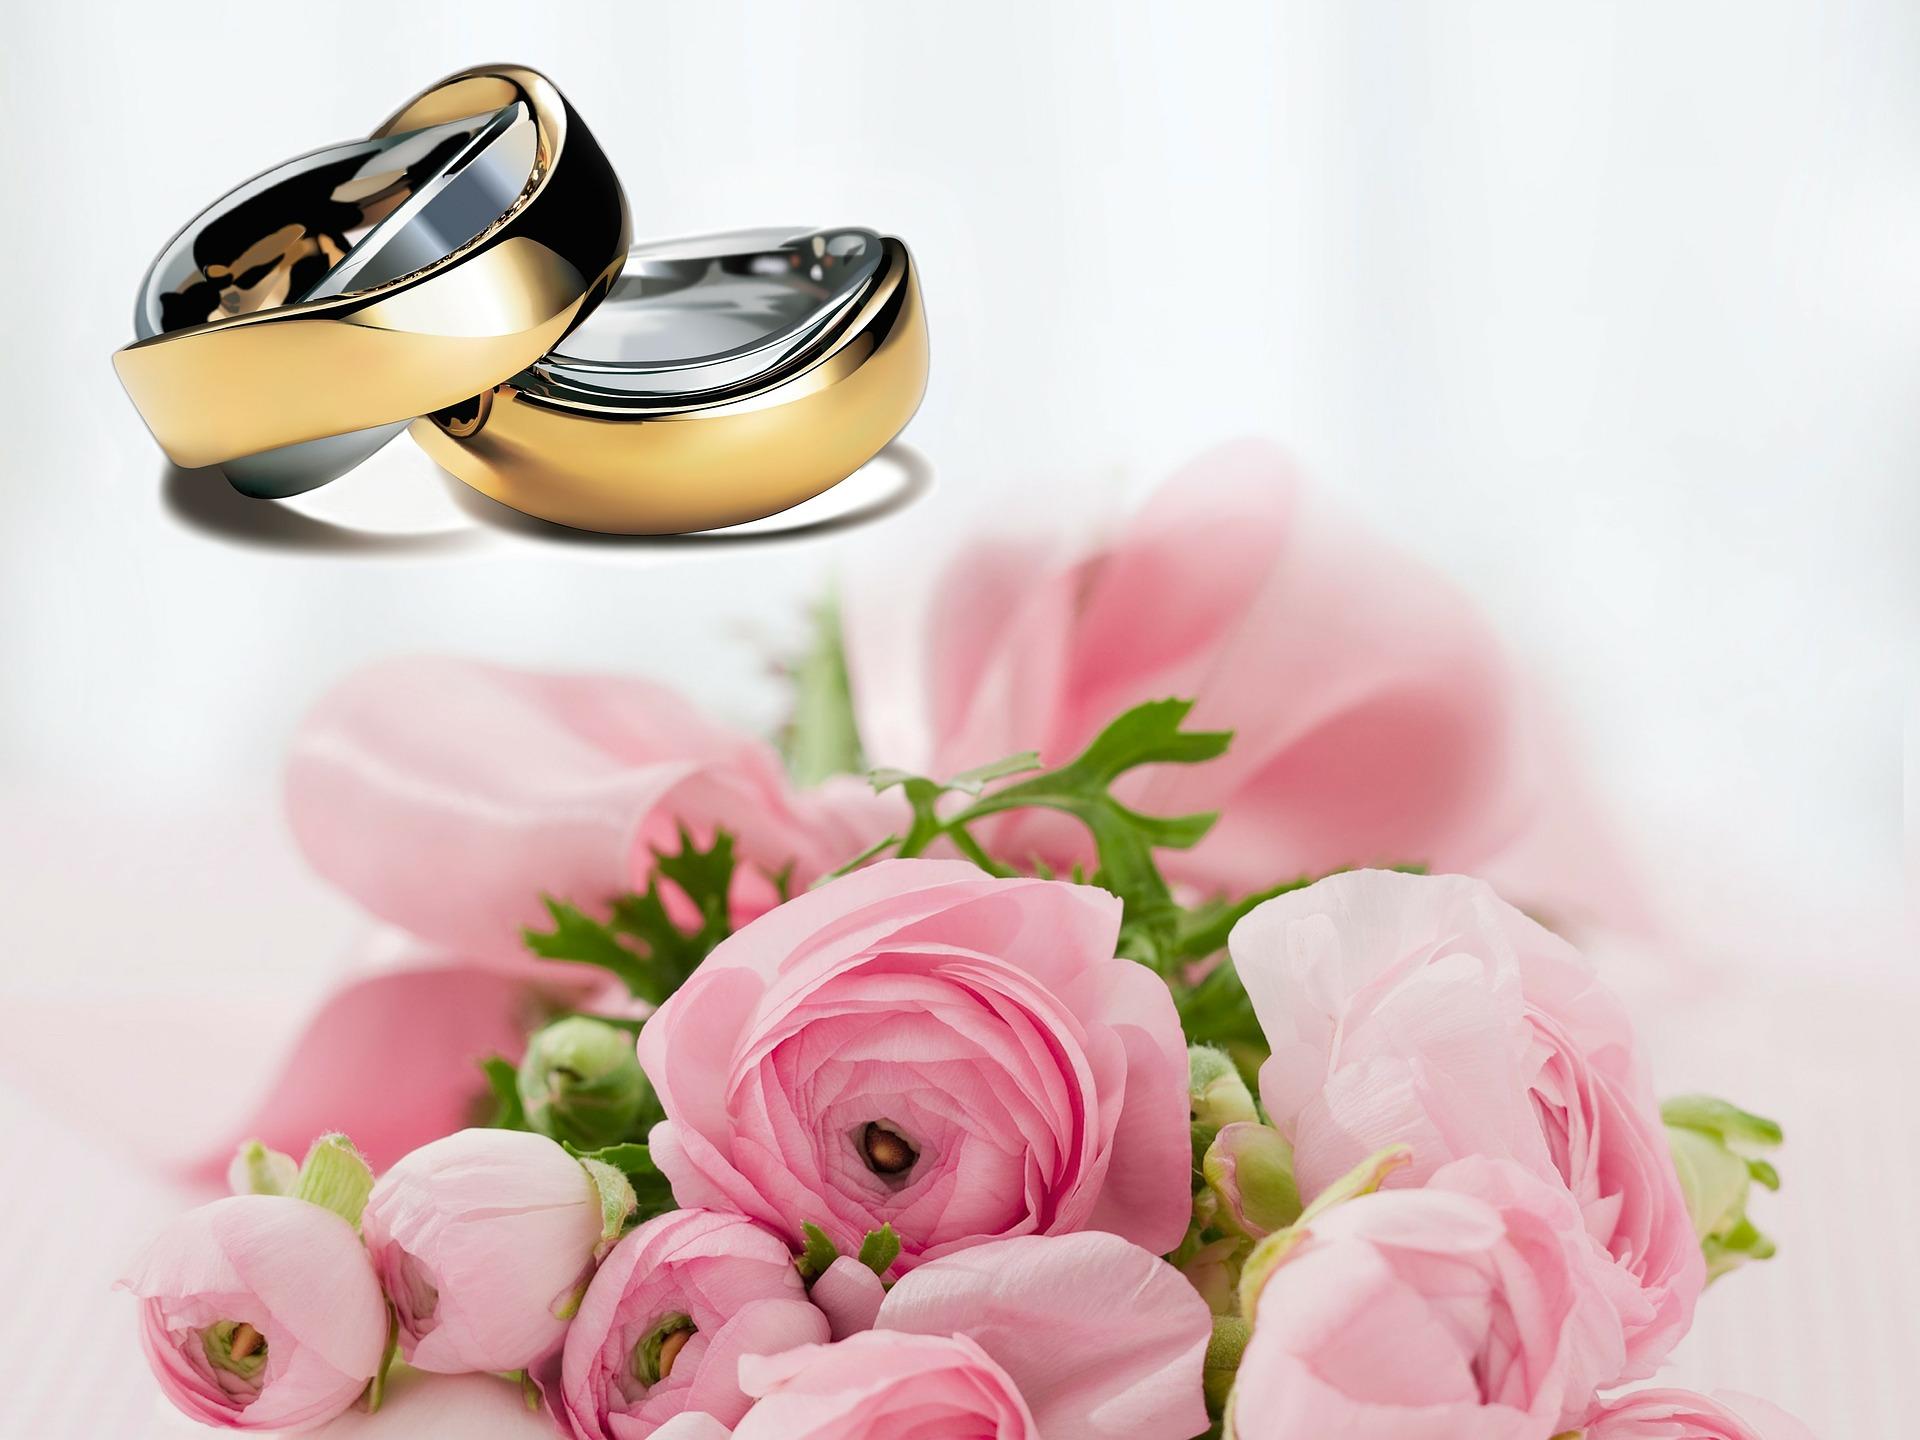 wedding-rings-251590_1920